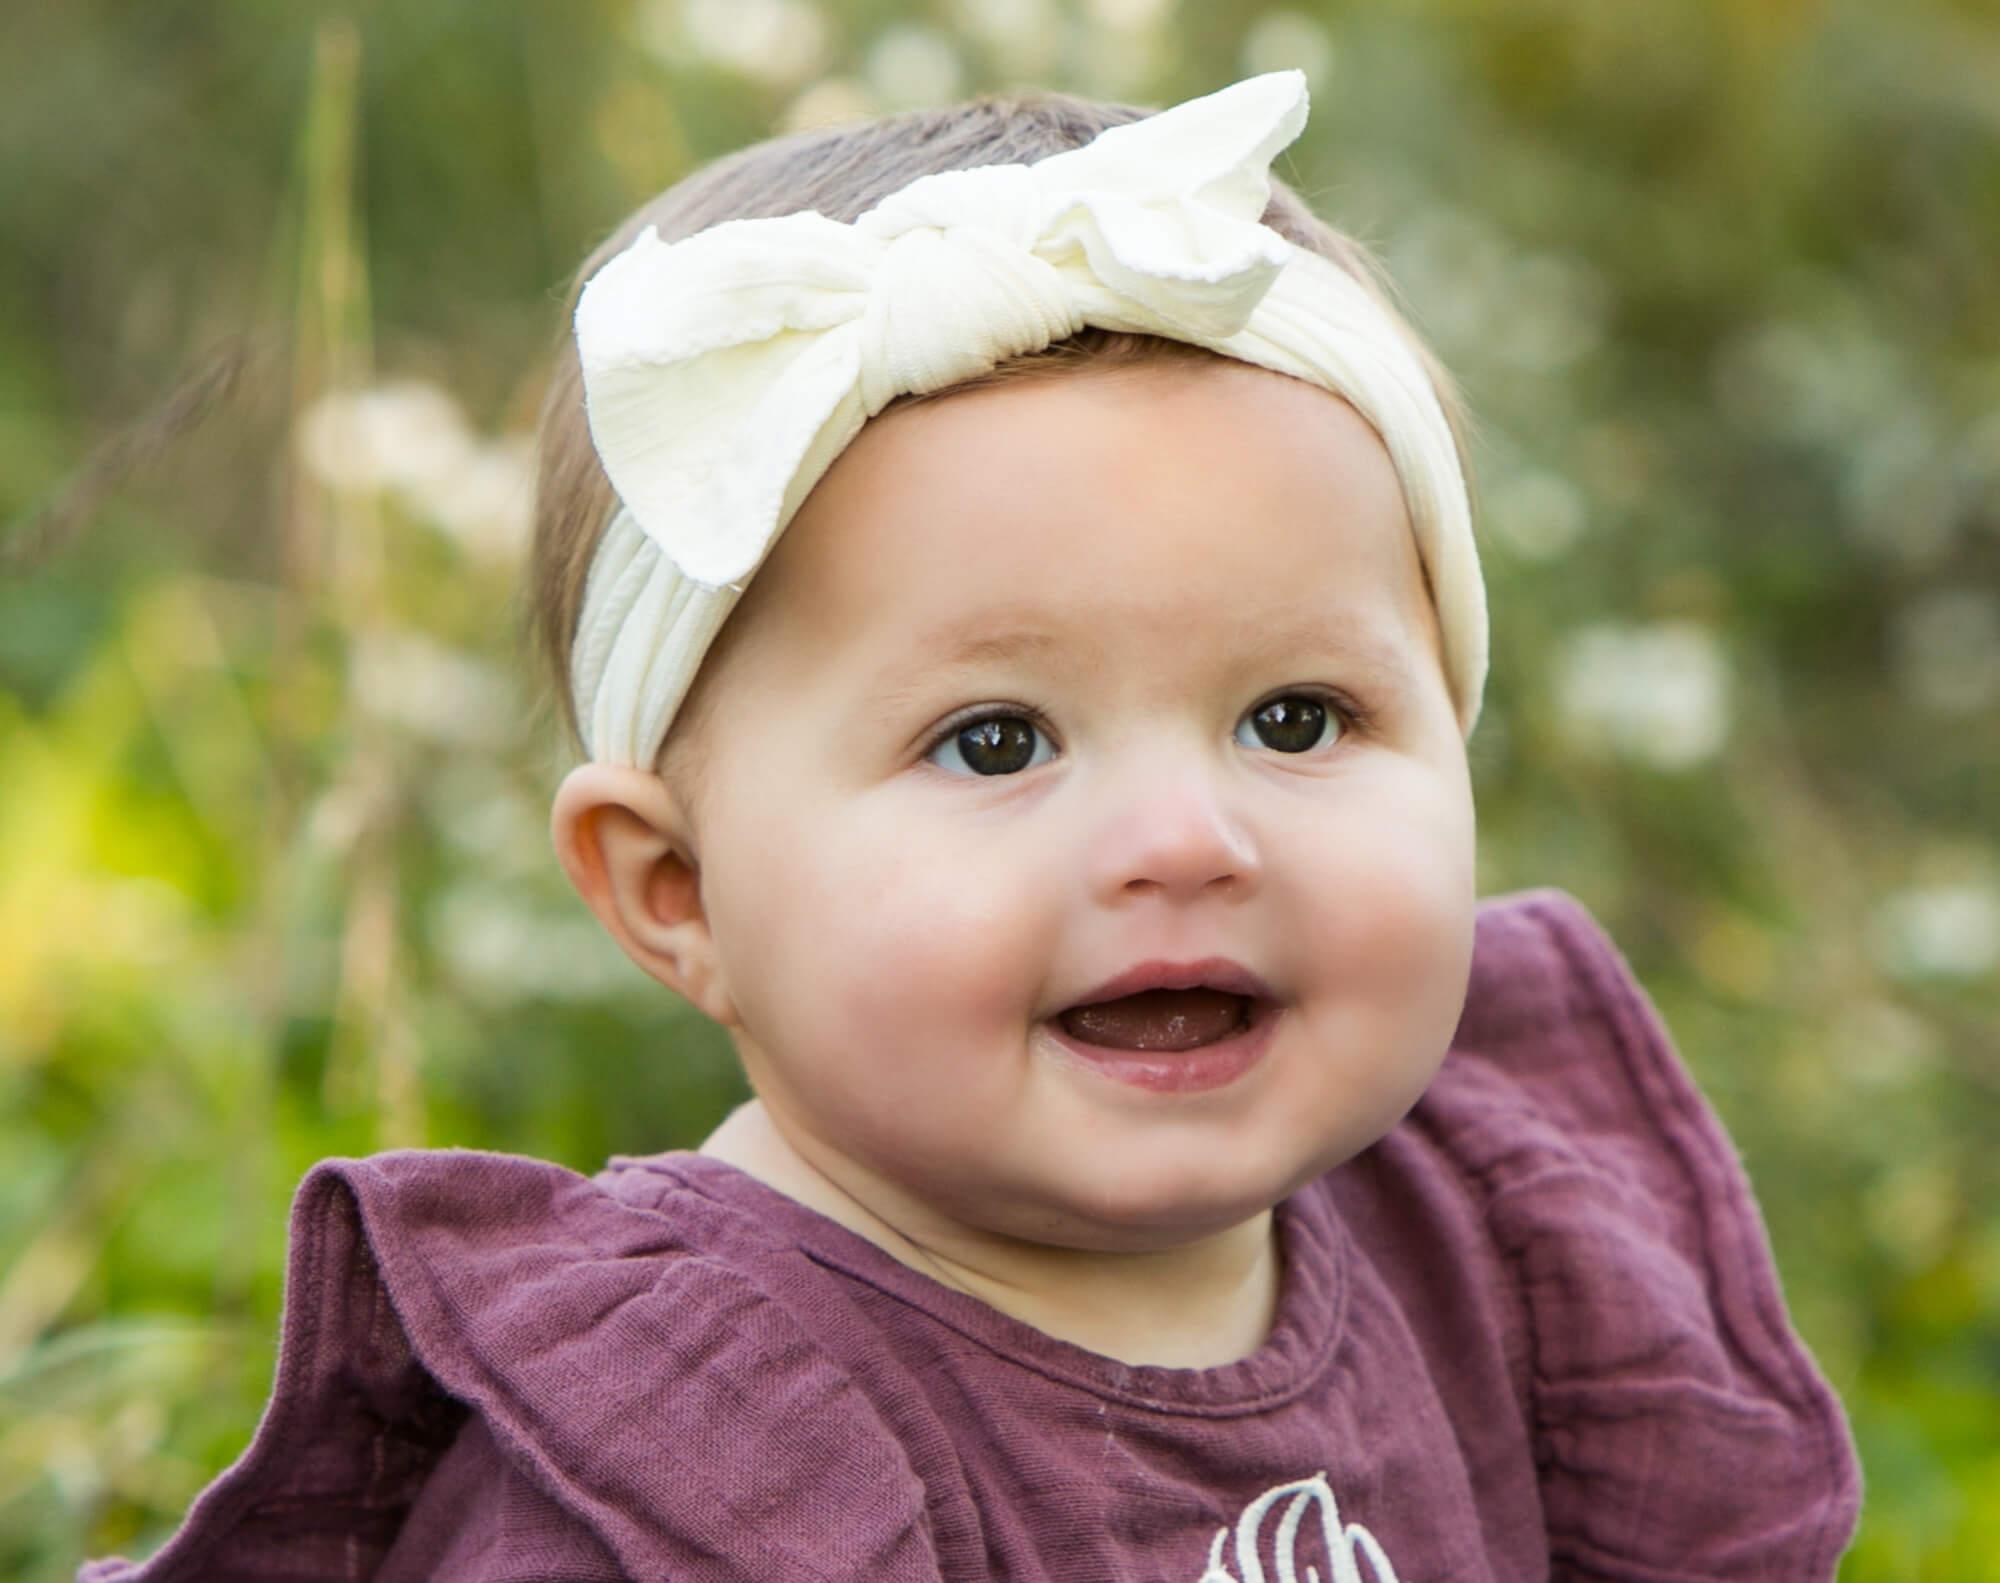 Garden photo of baby portrait